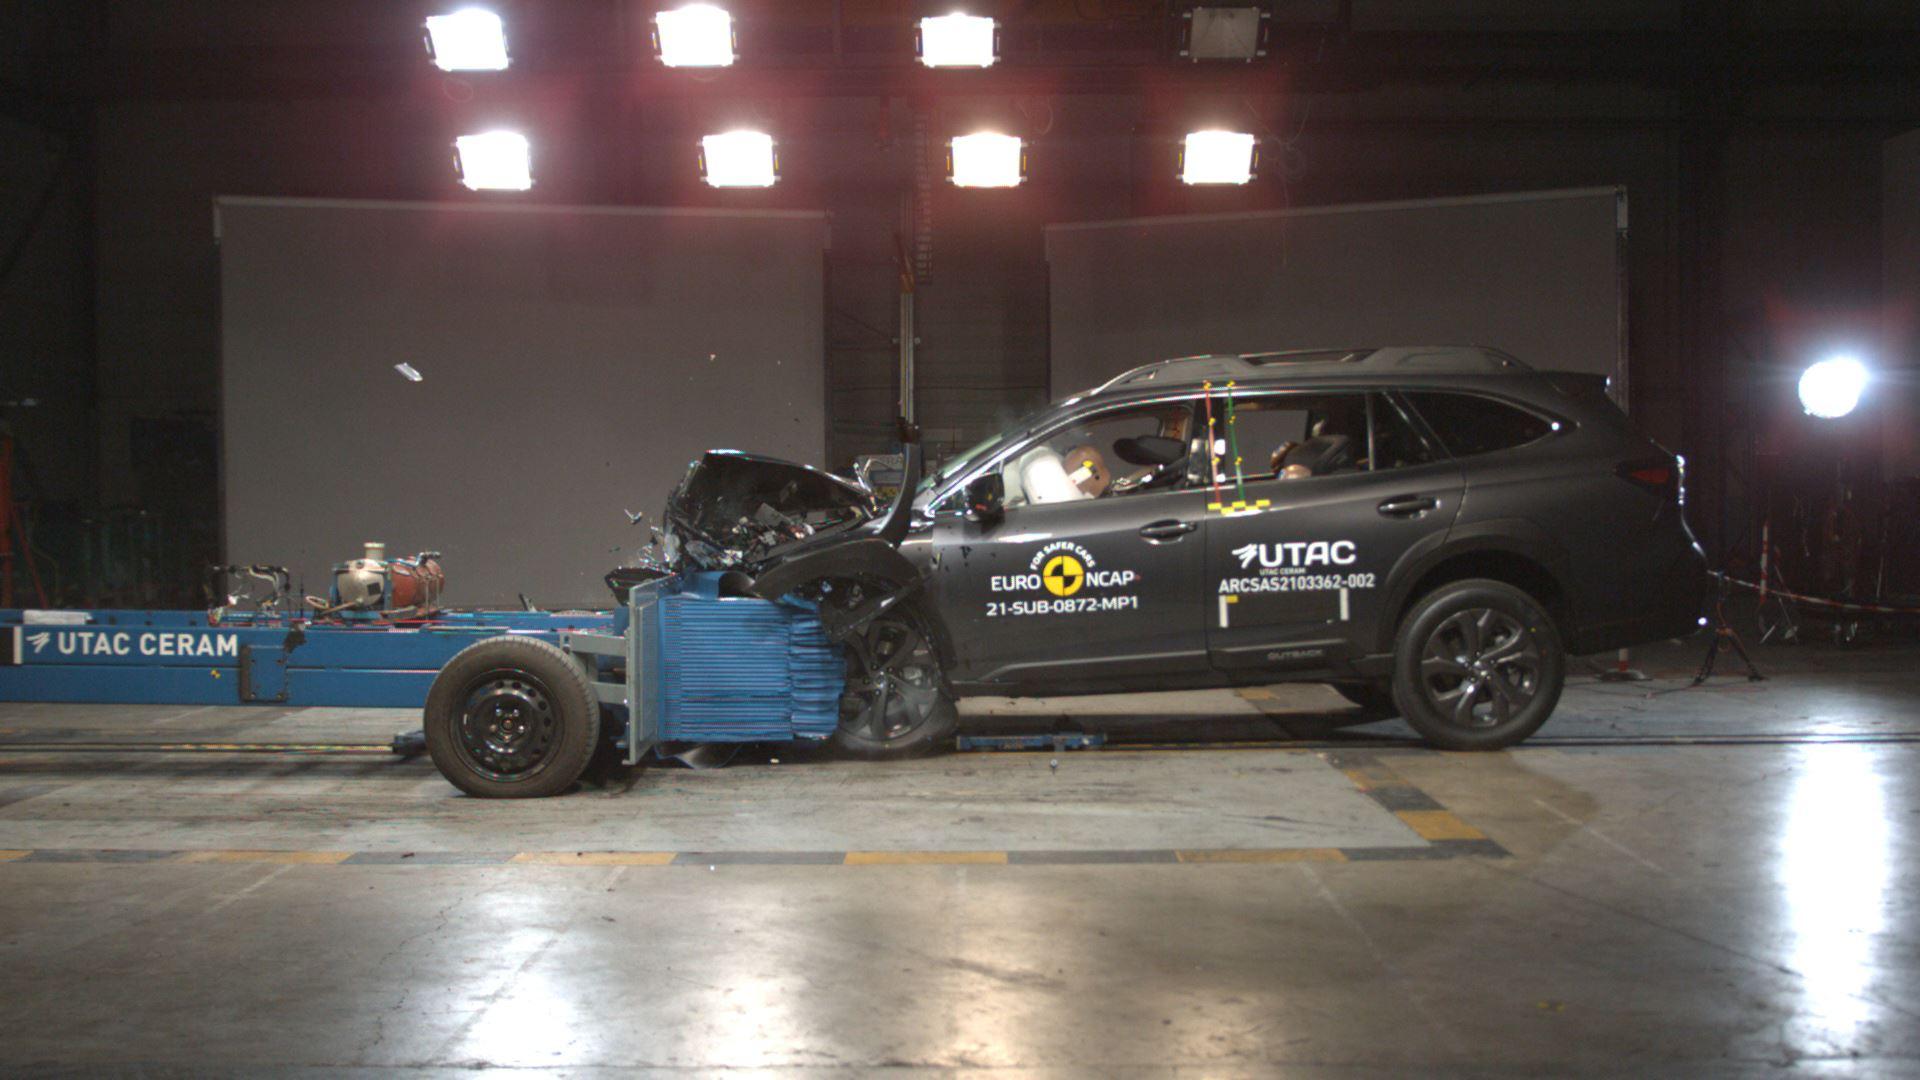 Subaru Outback - Mobile Progressive Deformable Barrier test 2021